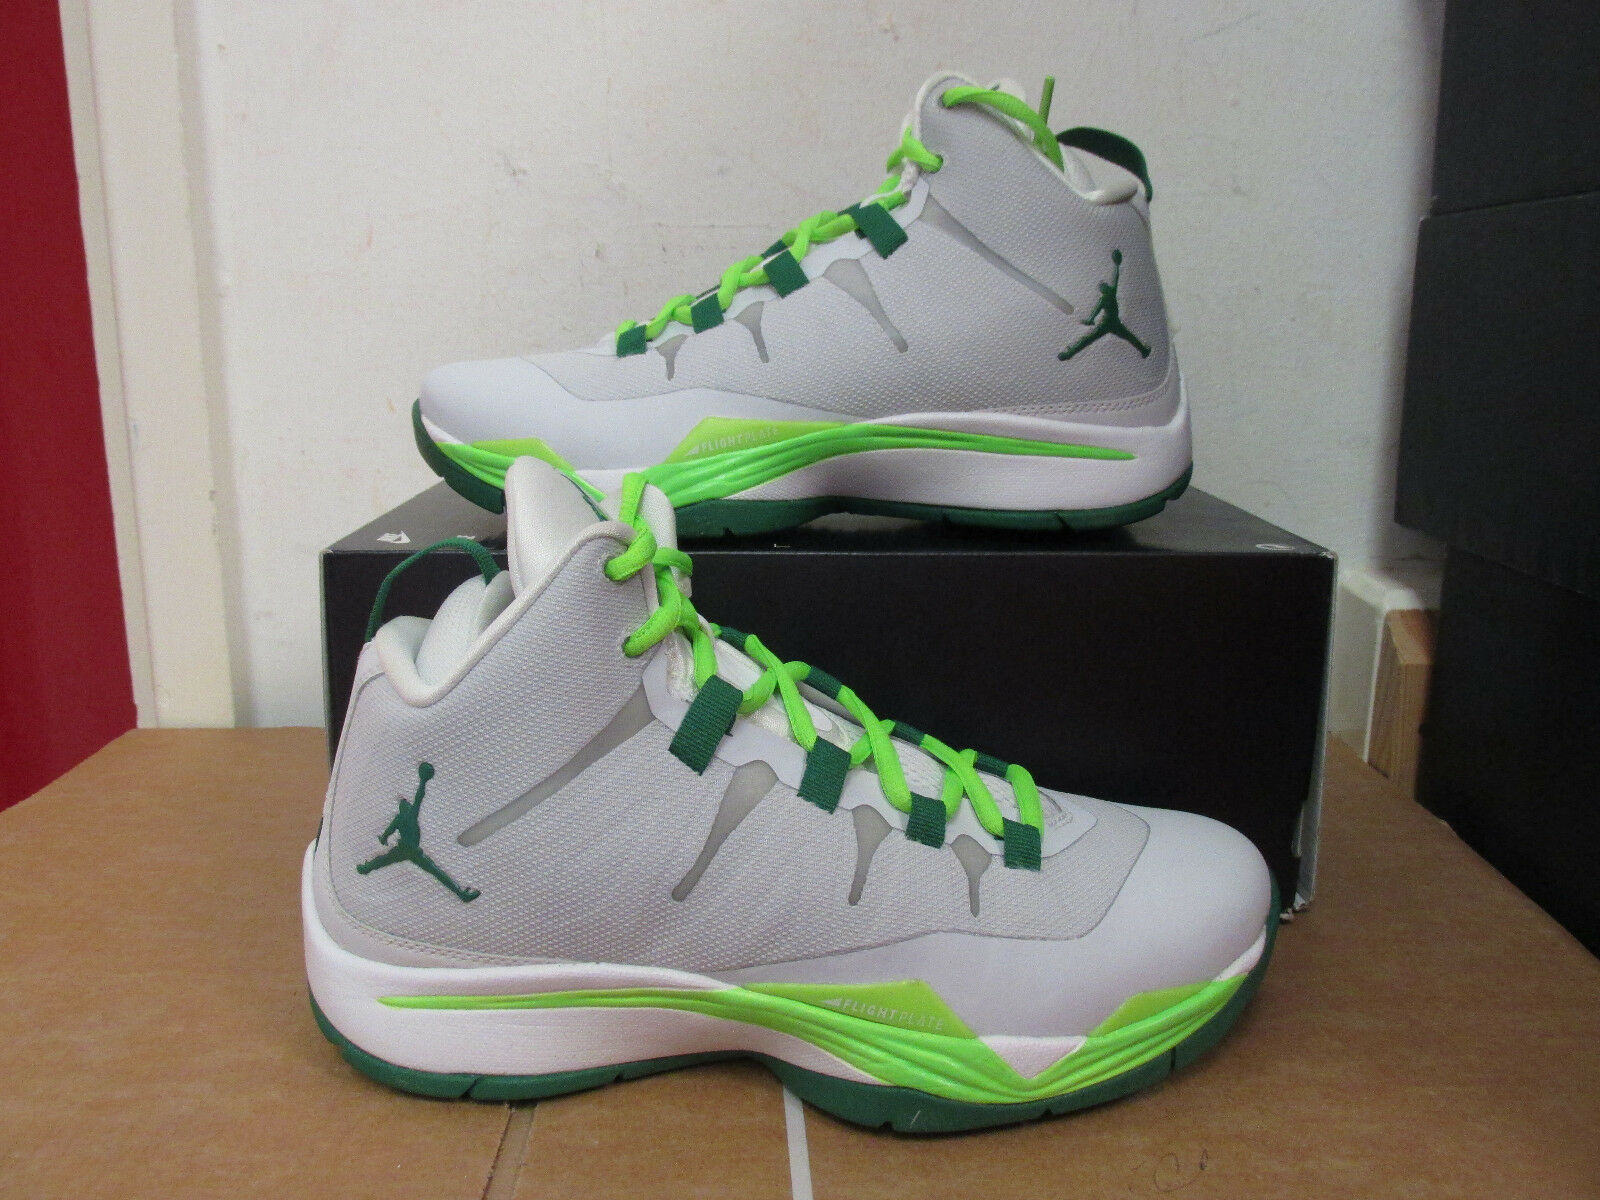 Nike Formatori Id Donne Jordan Superfly 2 Formatori Nike 628437 991   Noi 8,5 Ue 40 ccee81